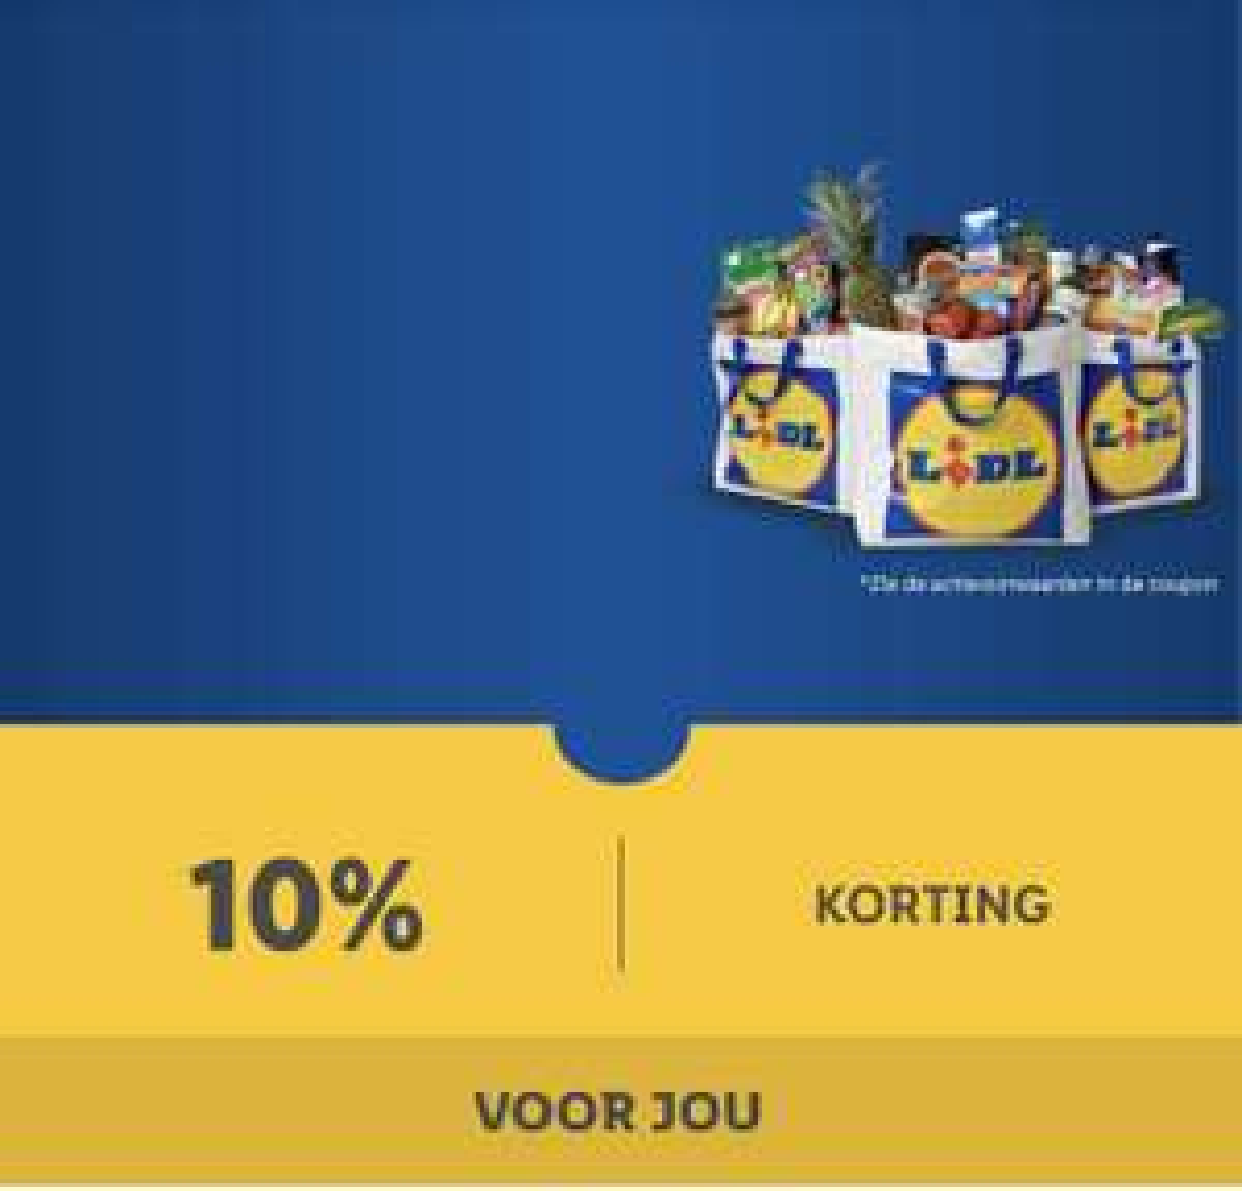 Lidl plus app aanbieding 10% korting op uw kassa bon*